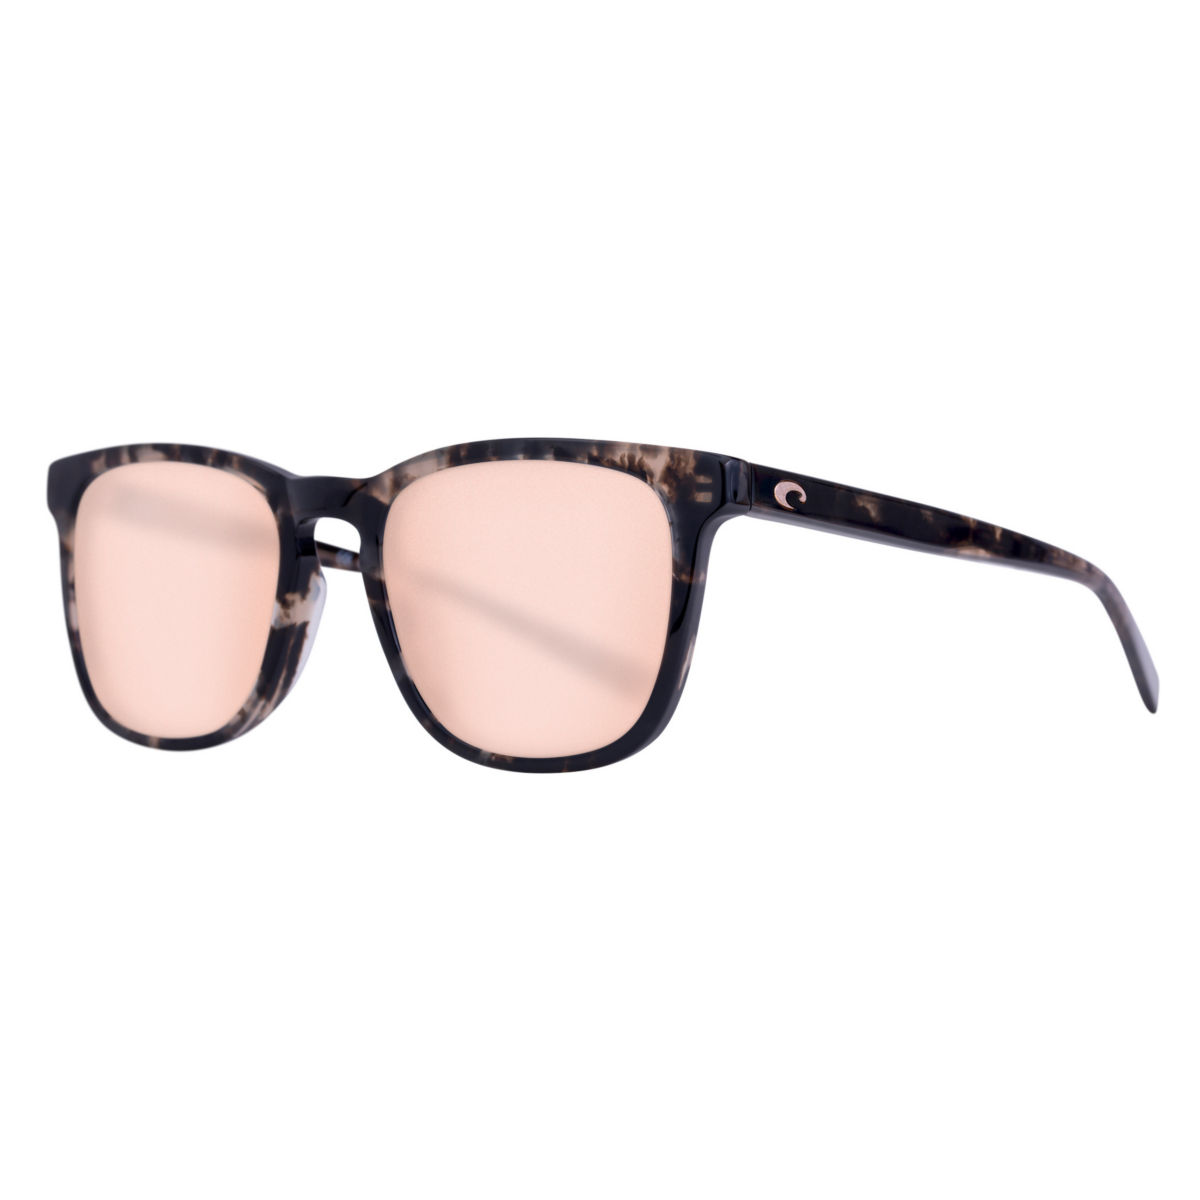 Costa Sullivan Sunglasses - image number 0